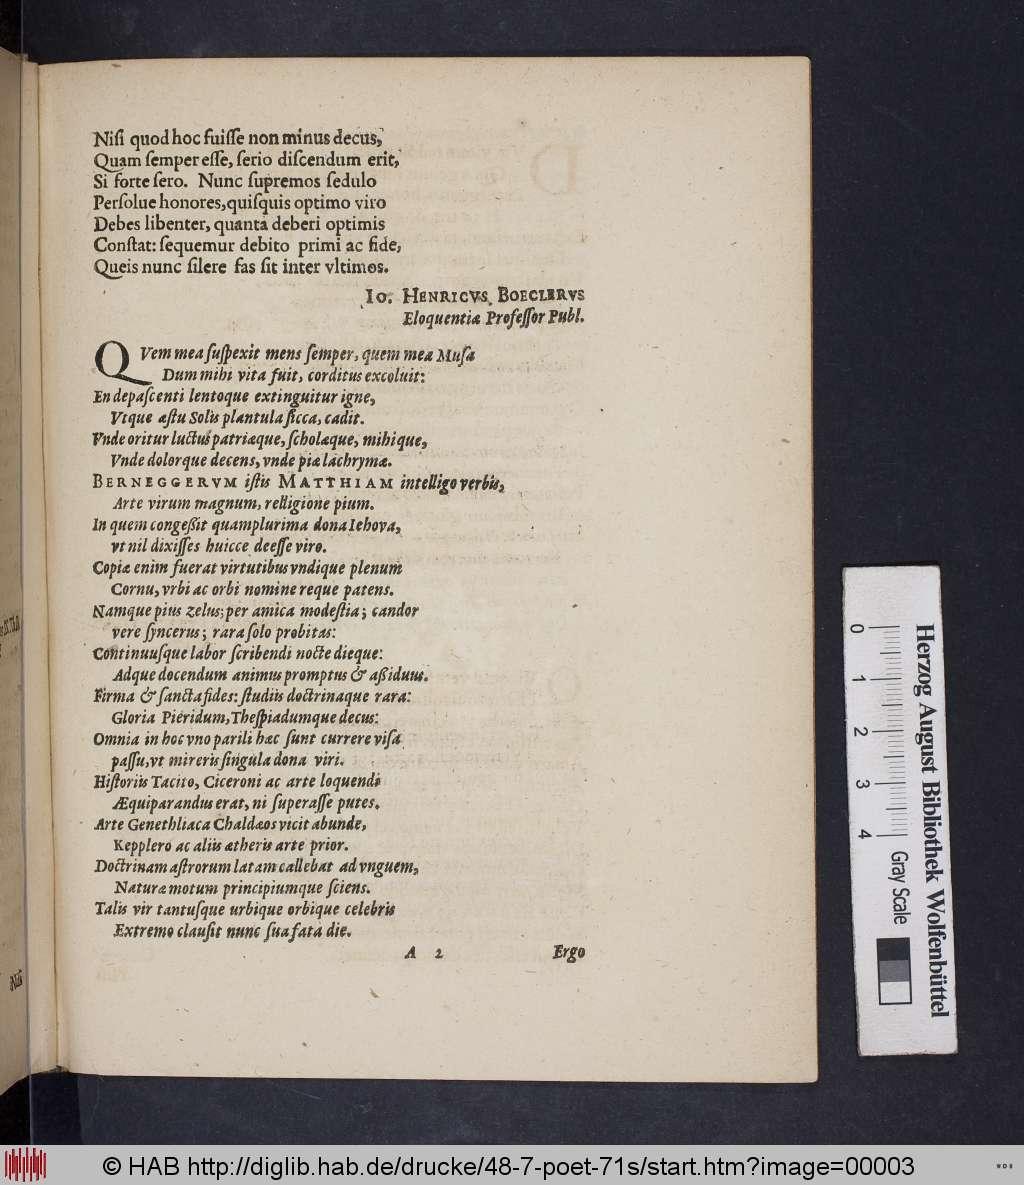 https://diglib.hab.de/drucke/48-7-poet-71s/00003.jpg